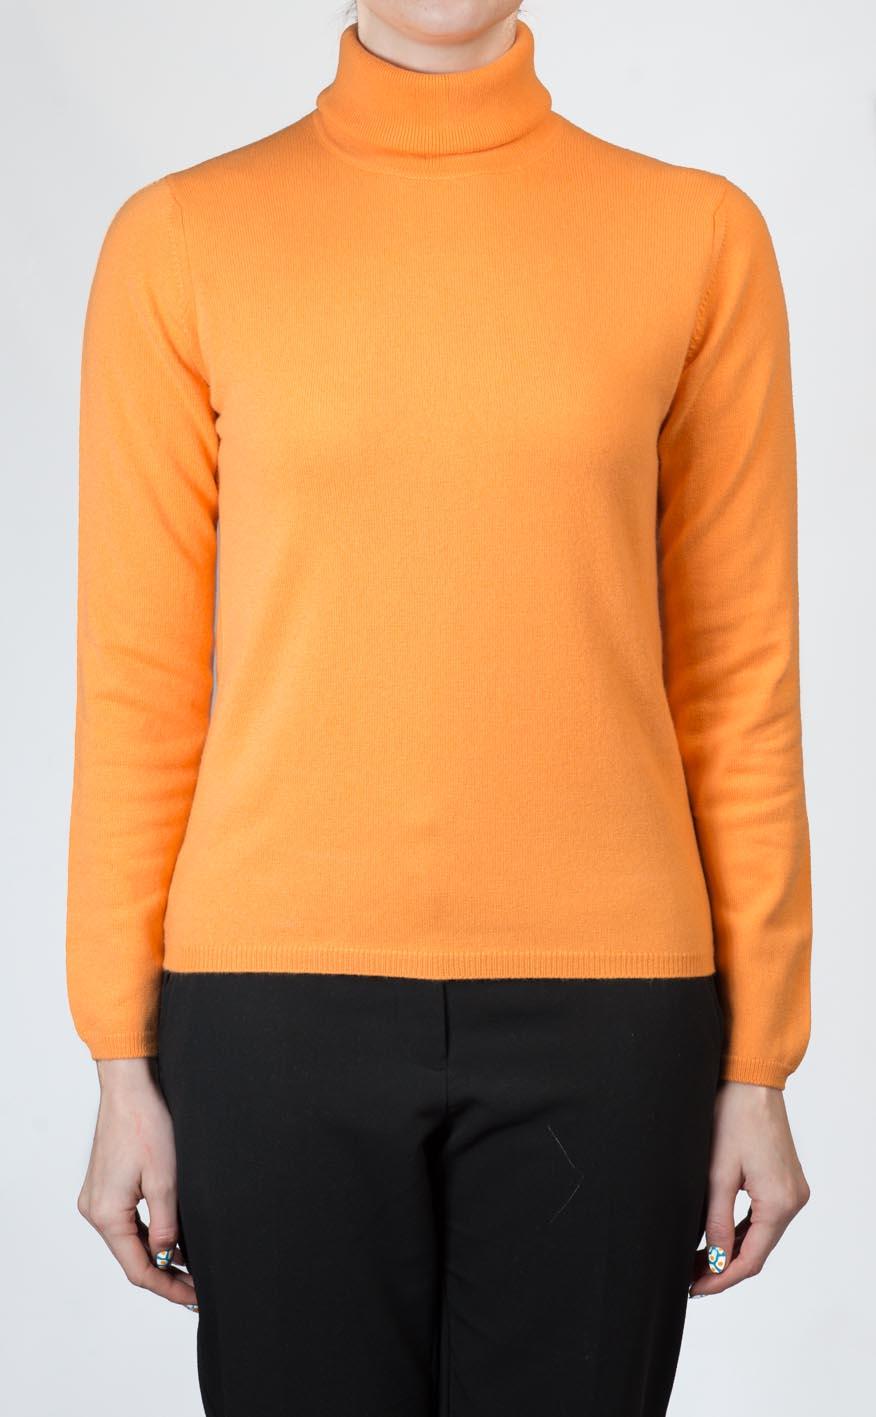 Ladies Luxury Scottish Cashmere Sweater, Roll Neck by Scotweb